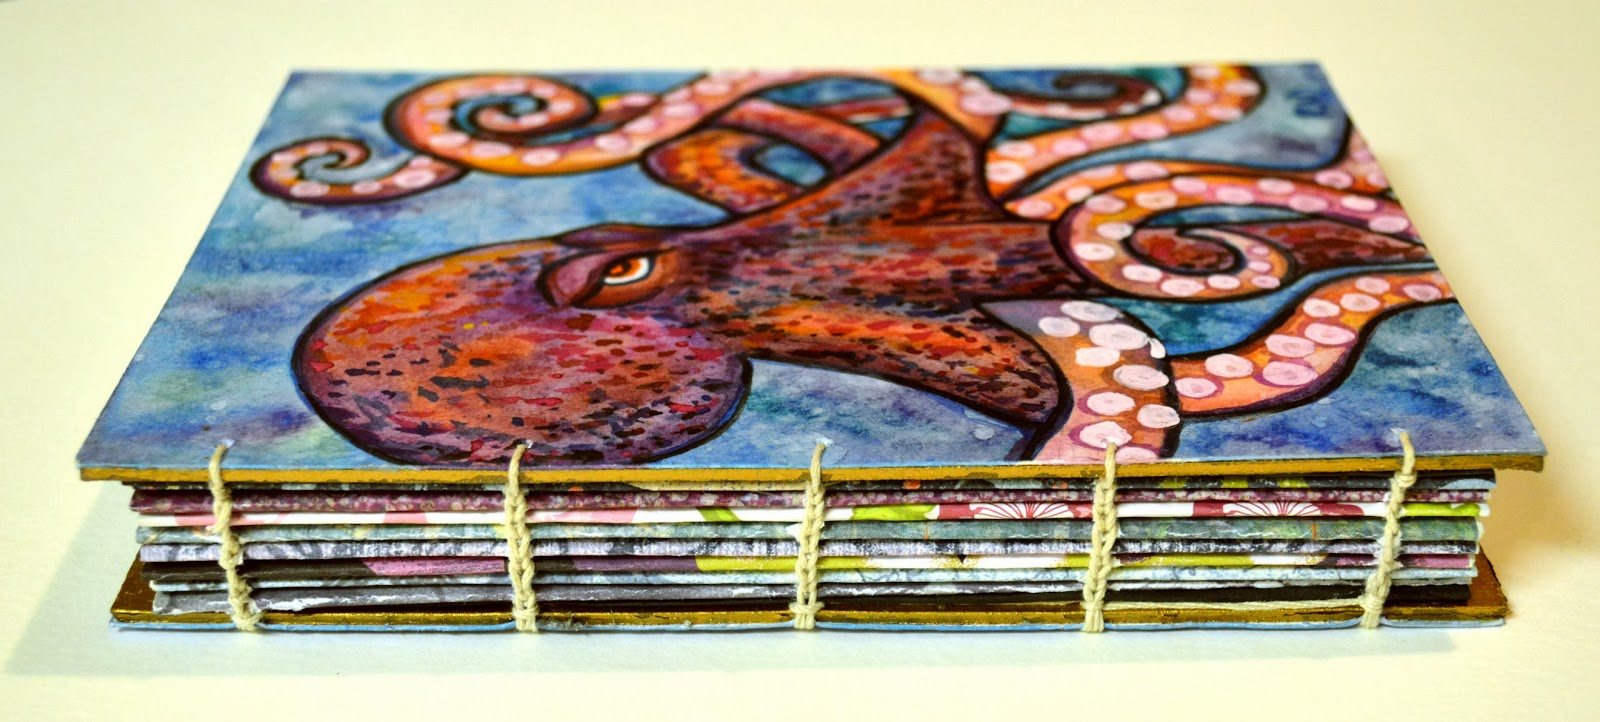 https://www.etsy.com/listing/181338970/handpainted-octopus-journal-sketchbook